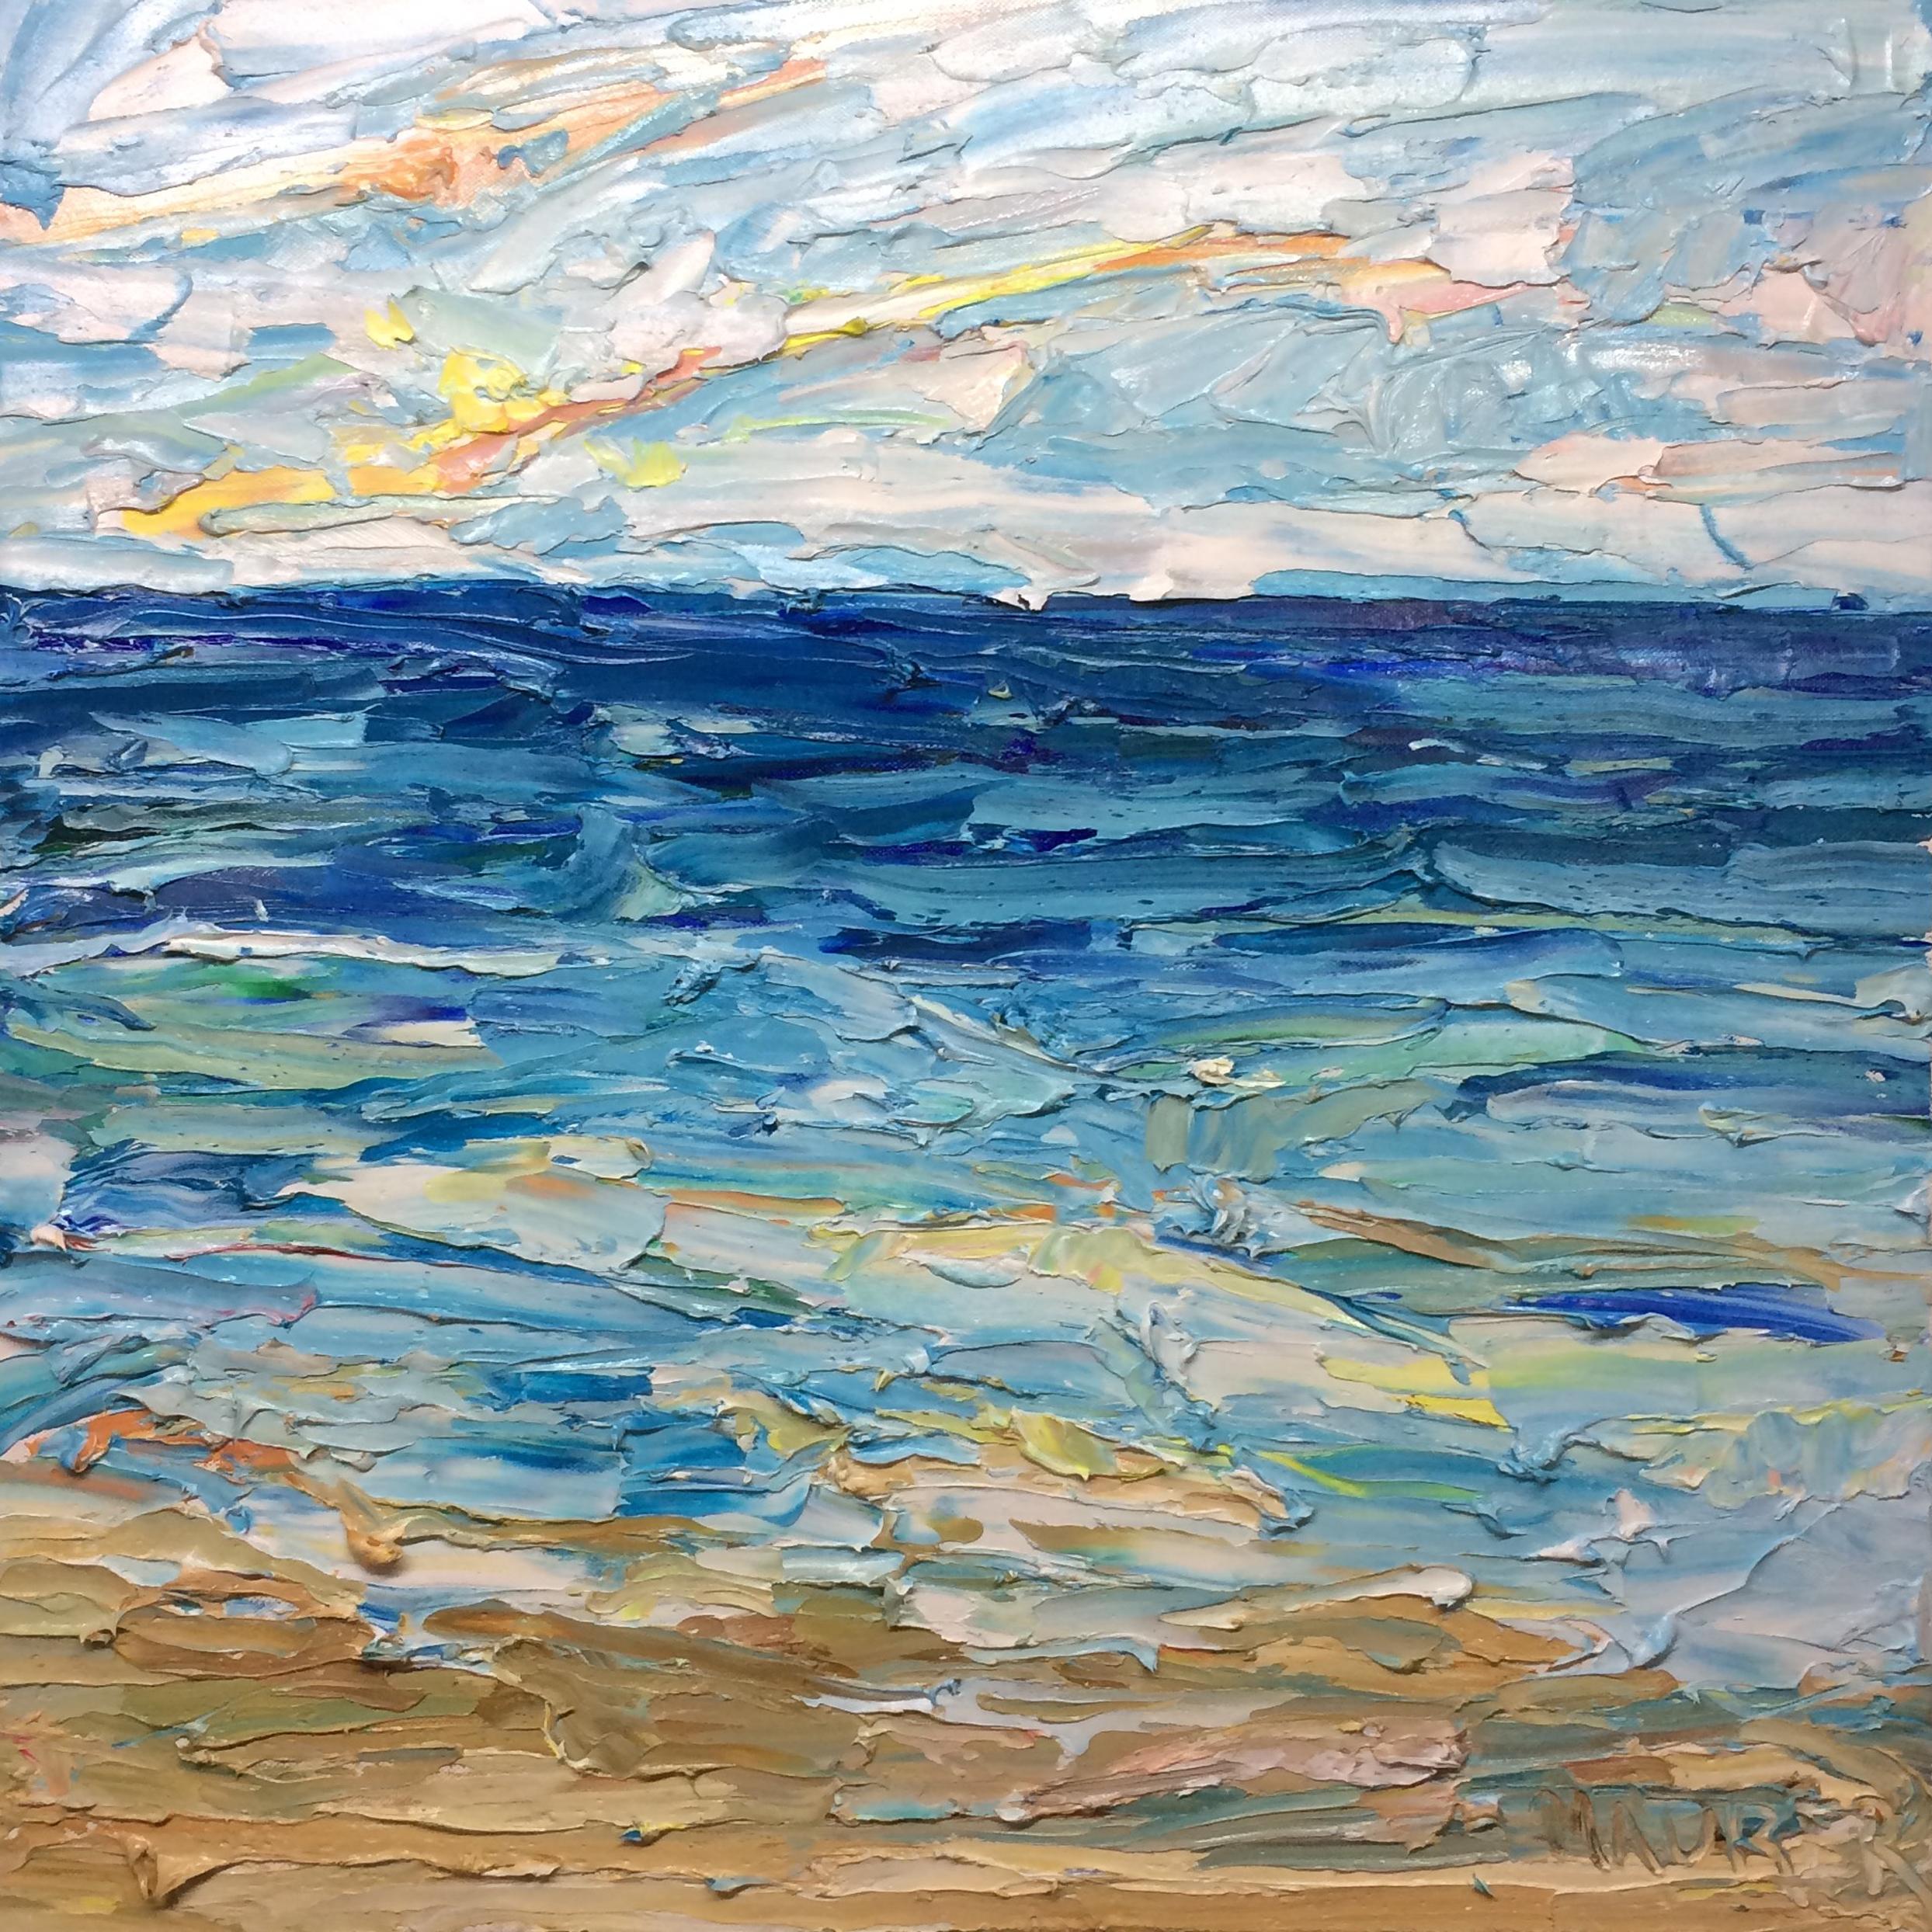 Ocean Sun, Oil on canvas, 24x24 inches, $1,700, Jodie Maurer, Sold